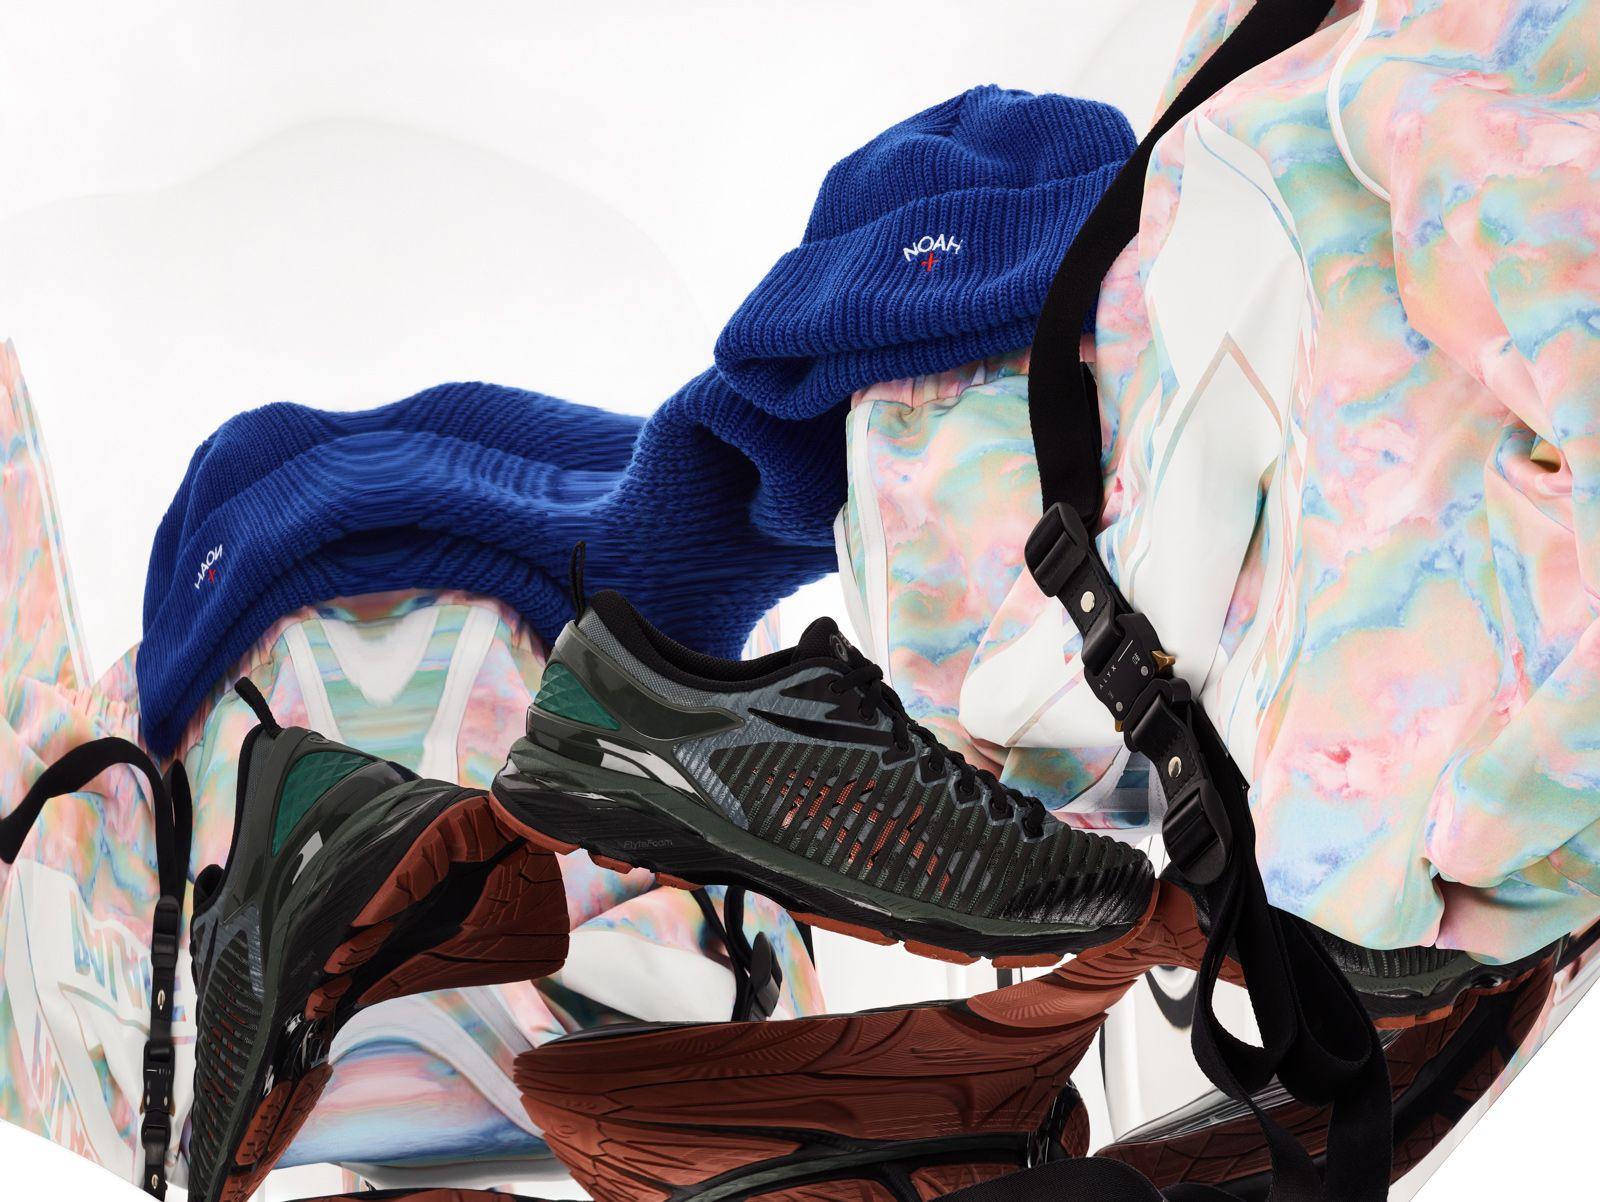 brands cultural credibility main2 1017 ALYX 9SM Adidas Aries